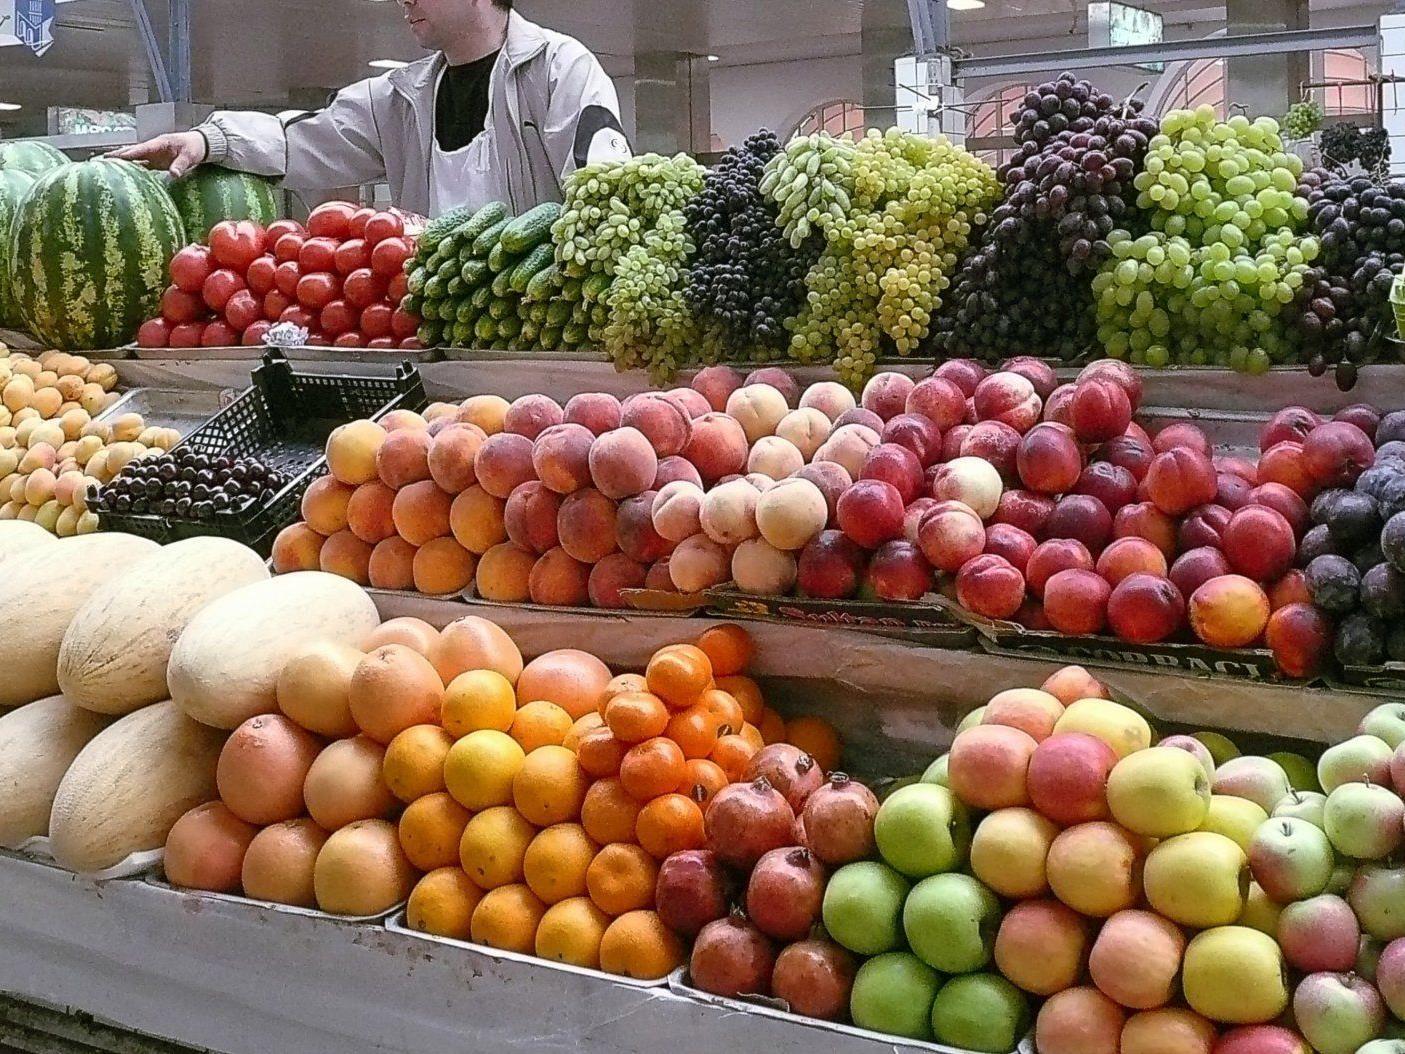 In Japan wurde nun beschlossen, den Höchstwert für radioaktives Cäsium bei Lebensmitteln zu senken.